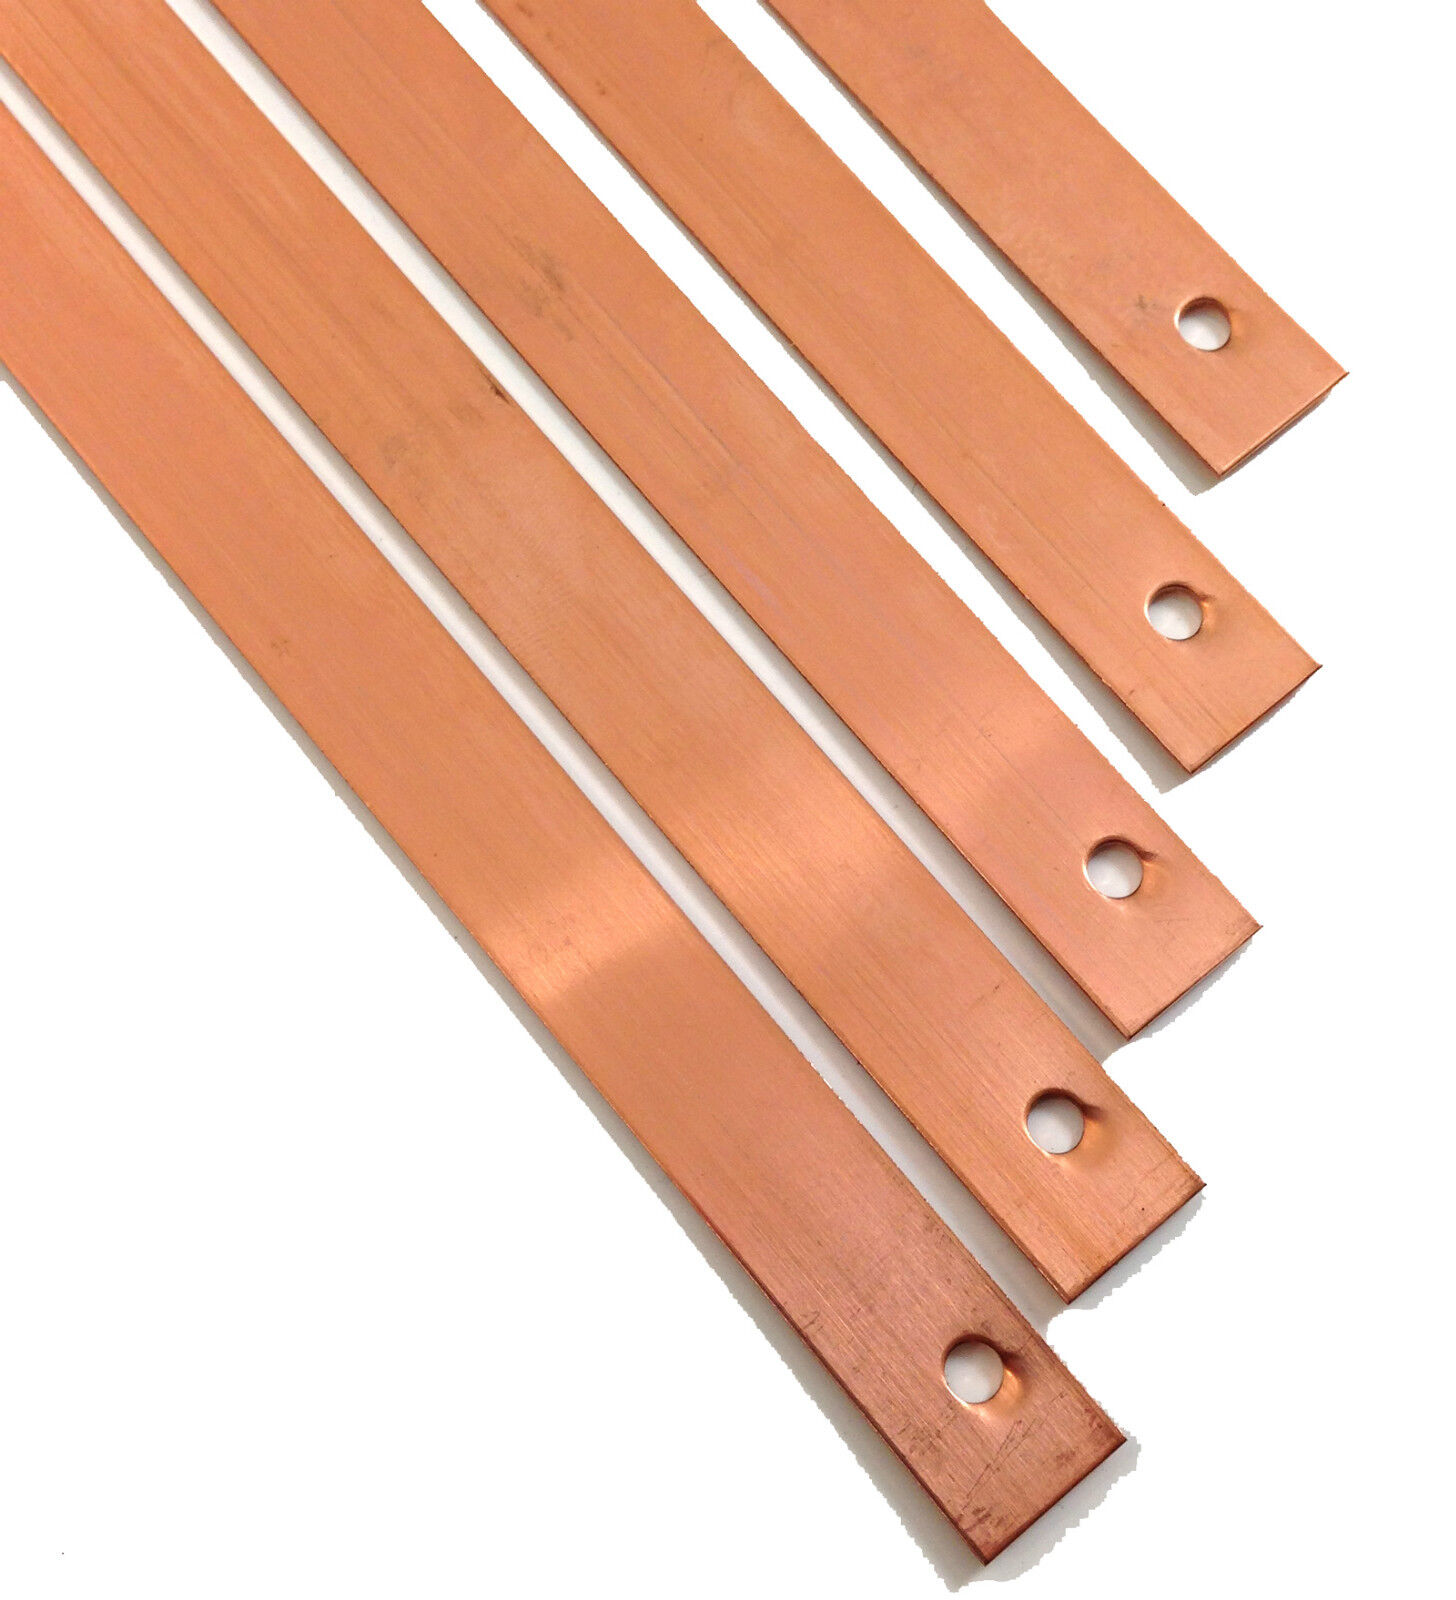 Copper Roofing Strips 150mm Slate Roof Tingle Moss Algae Remover Strip Ebay